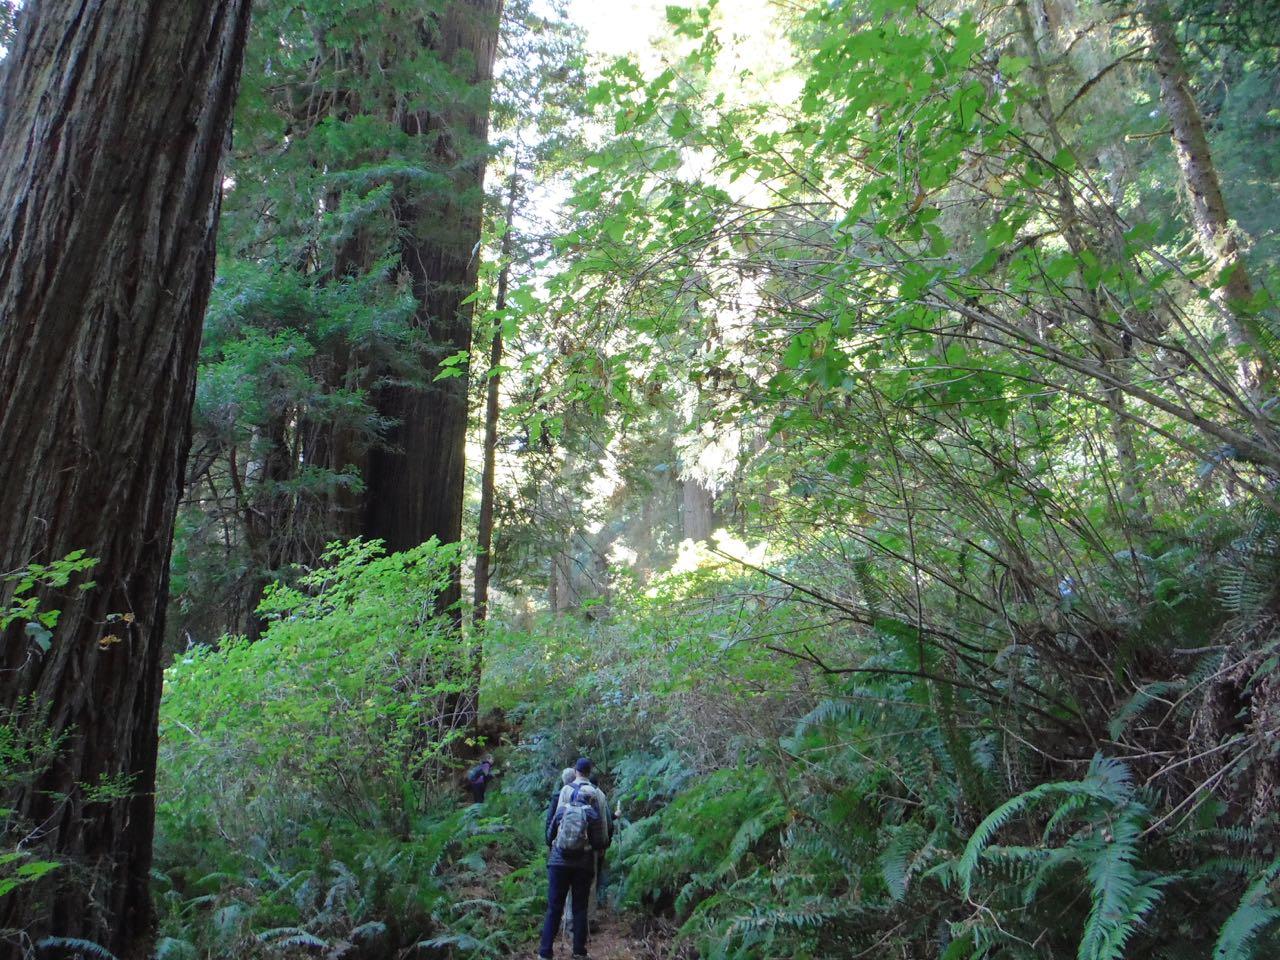 Redwoods 2017 10 08 238 Of 287